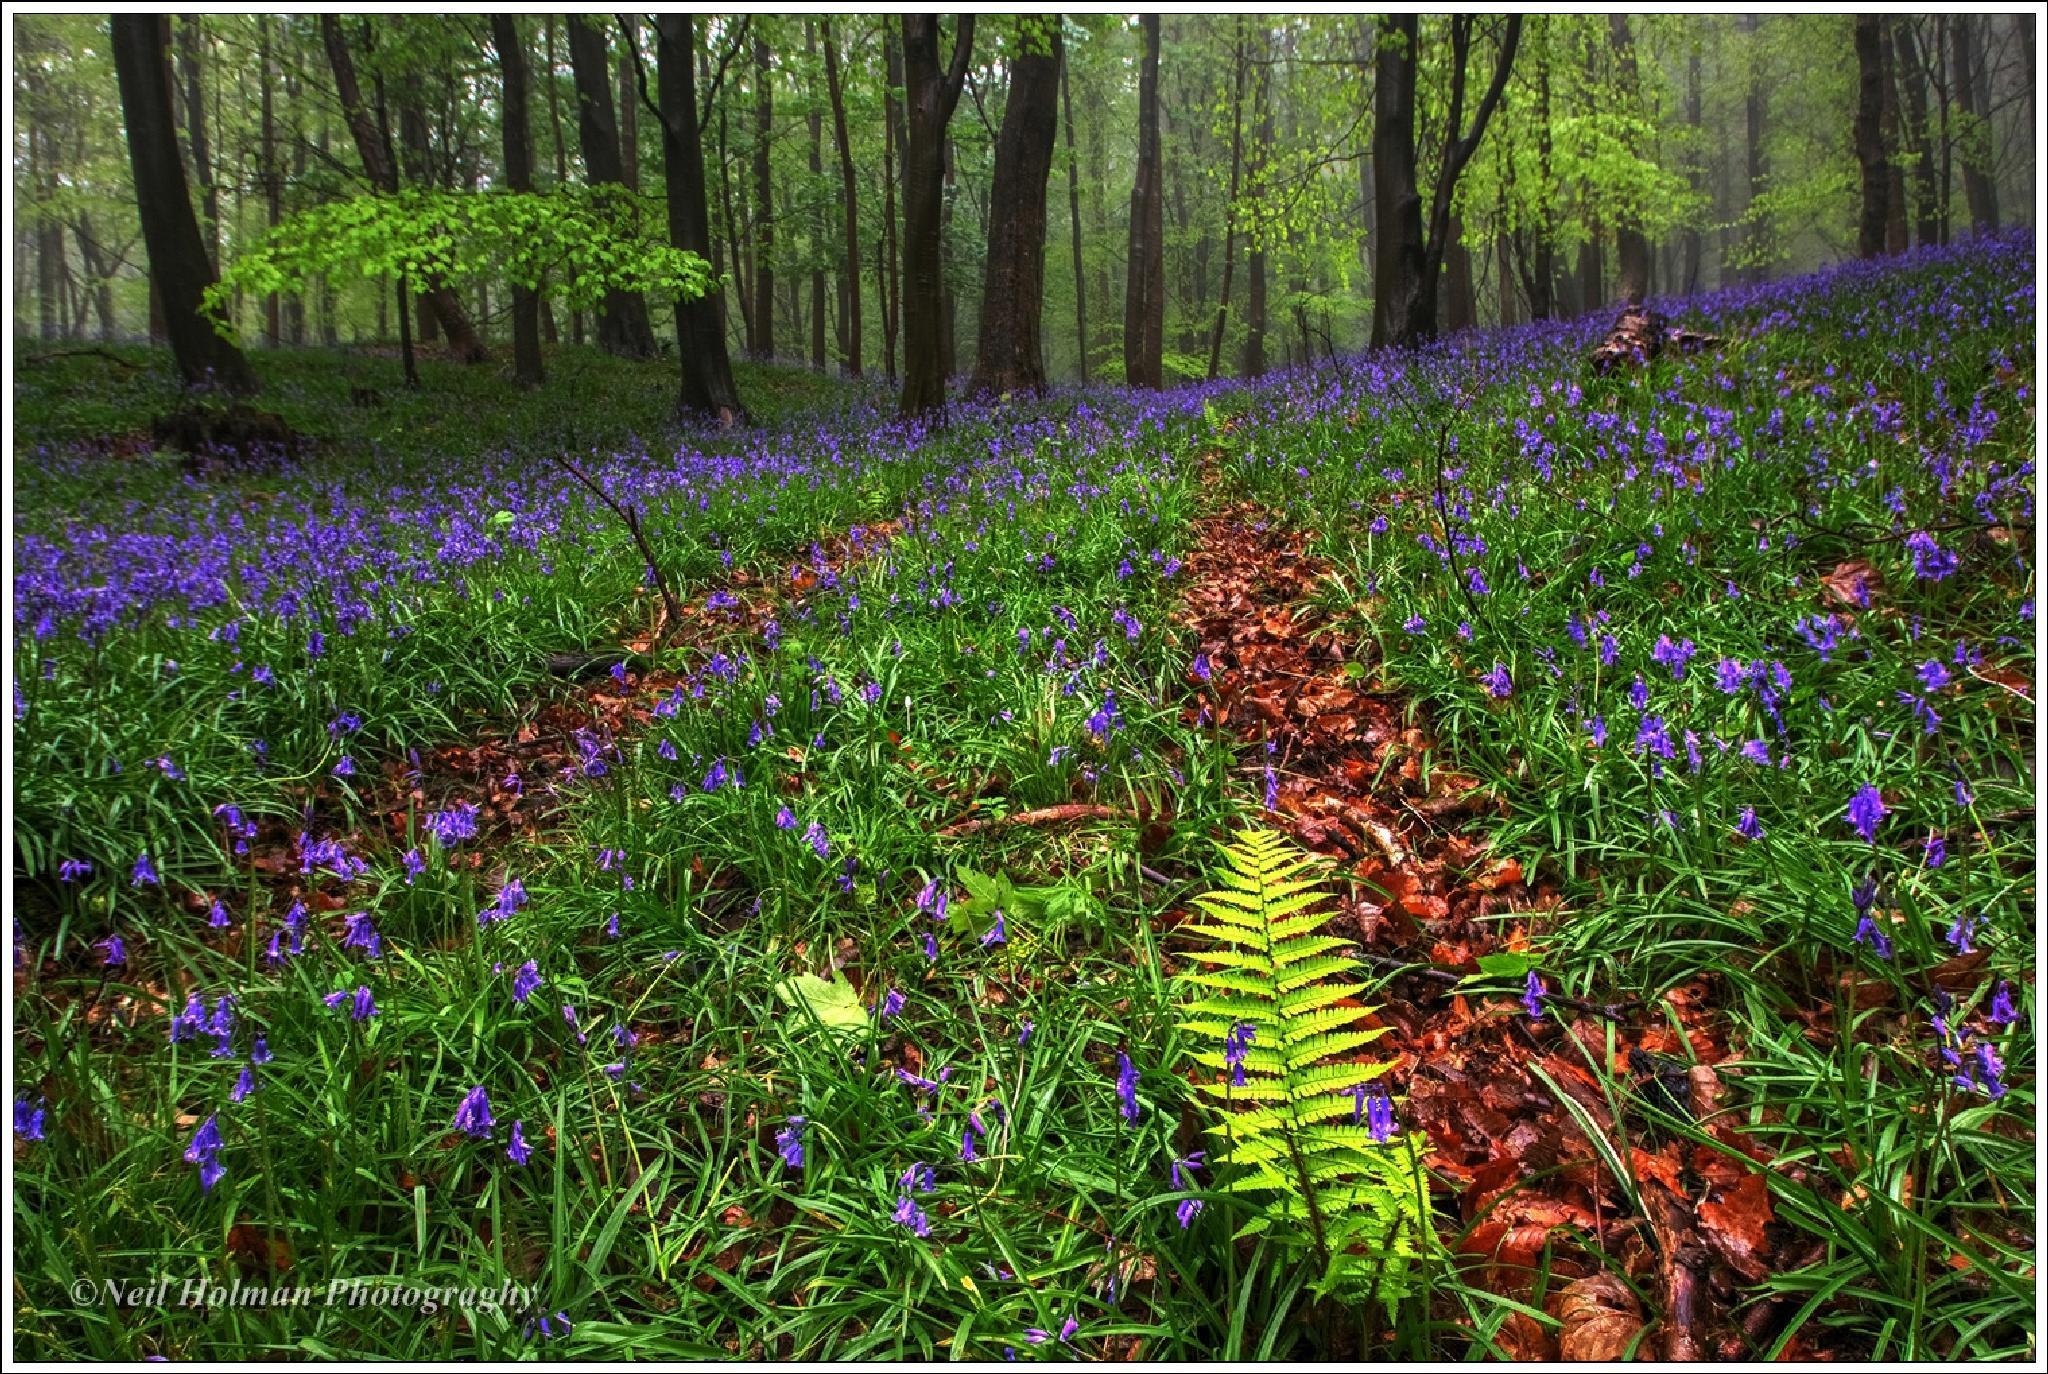 Margam Woods by Neil Holman